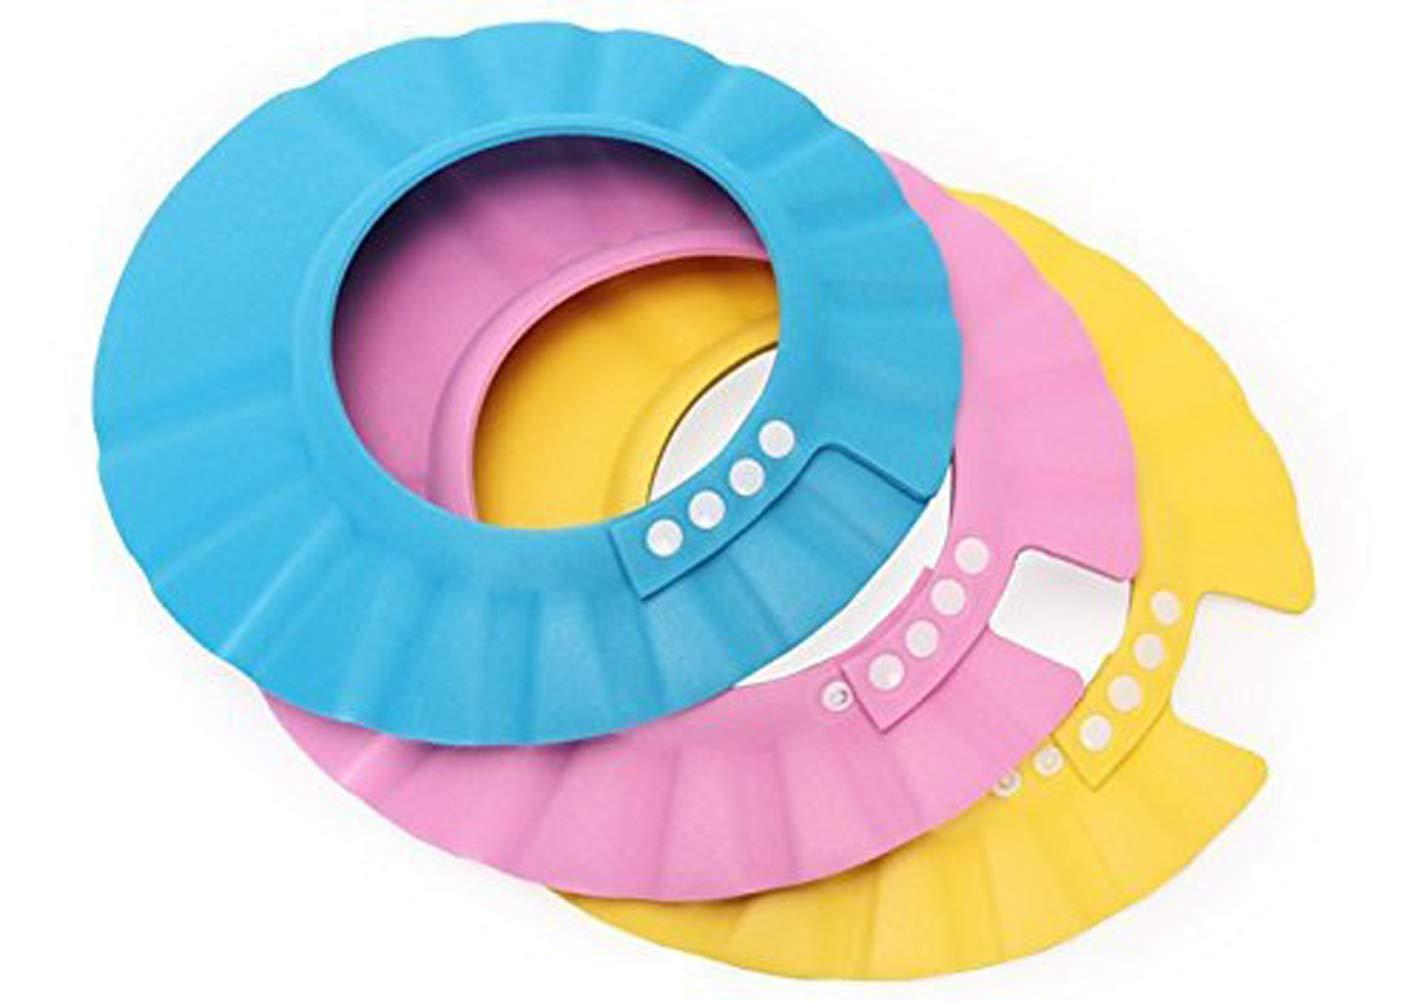 3pcs Soft Adjustable Shampoo Shower Cap Kids Bathing Protection Plastic Bath Hat Visor Cap for Toddler Baby Kids Children (Color Random, 27.5CM/10.8IN)